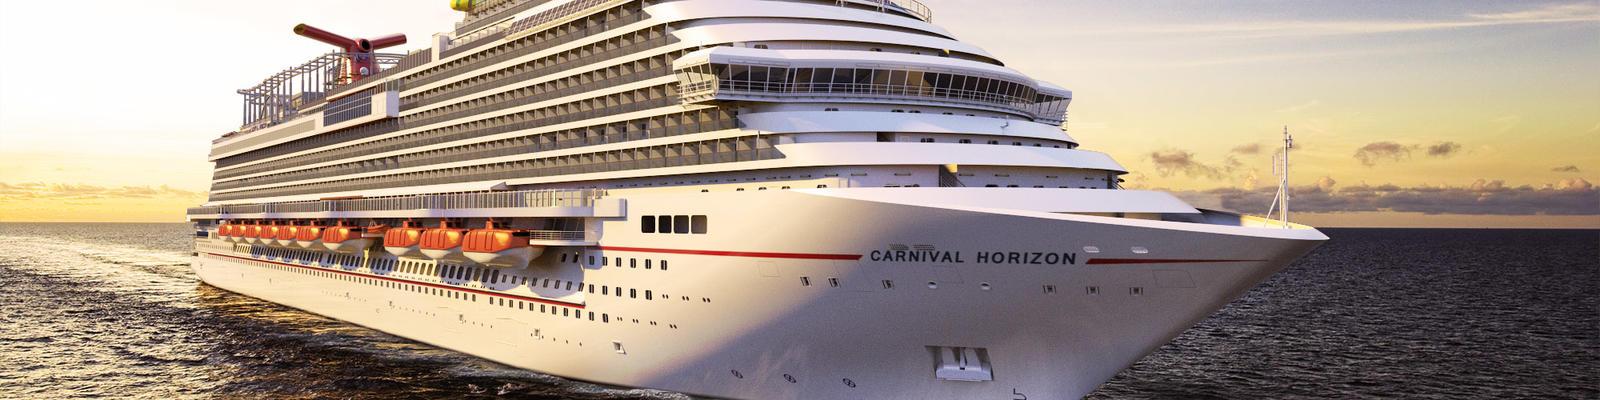 5 free activities on carnival horizon cruise critic